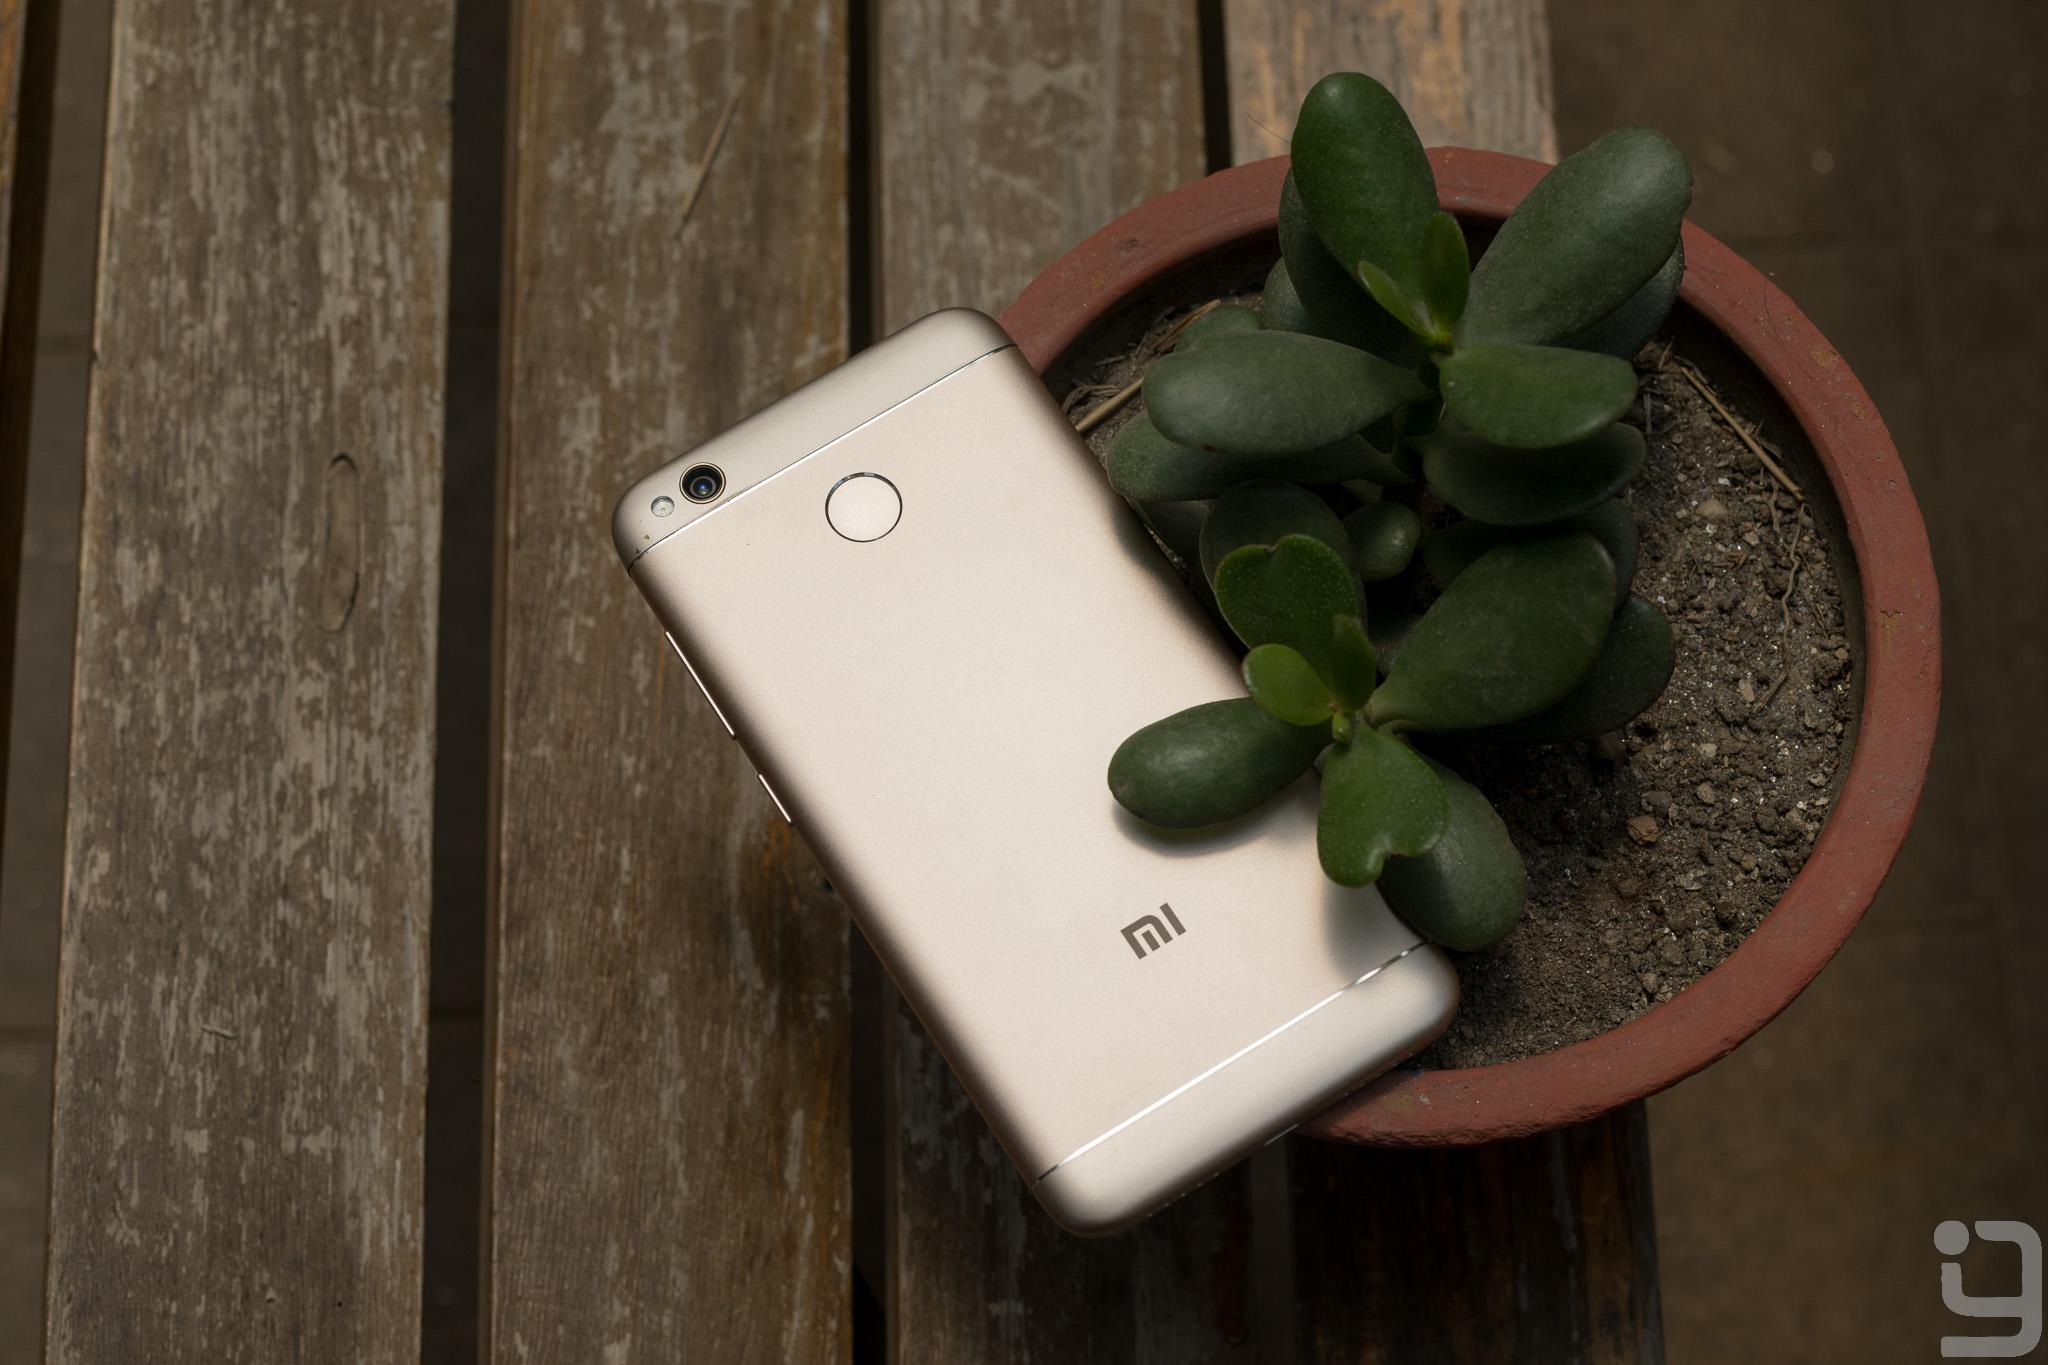 Xiaomi Redmi 4x 3gb 32gb Launched In Nepal Gadgetbyte Nepal